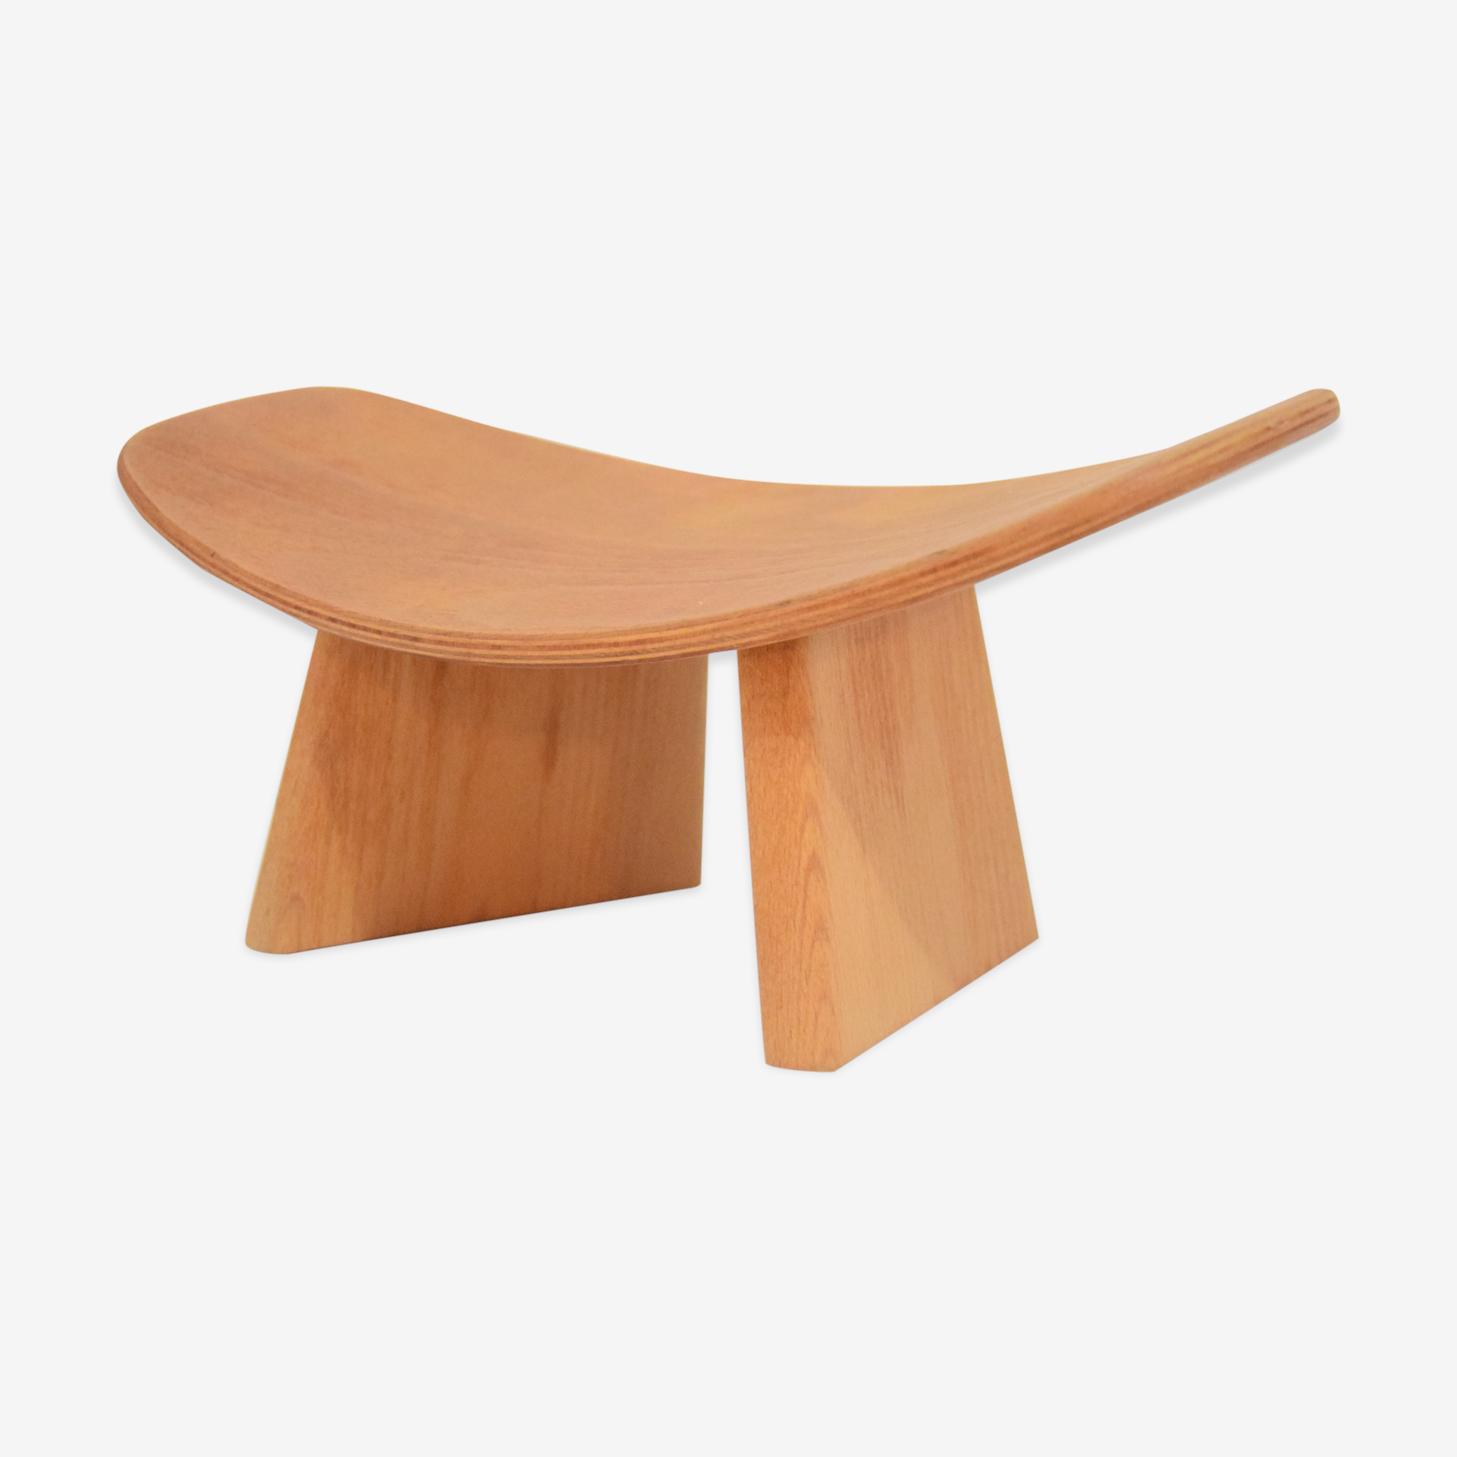 Tabouret minimaliste en hêtre massif d'Alain Gaubert